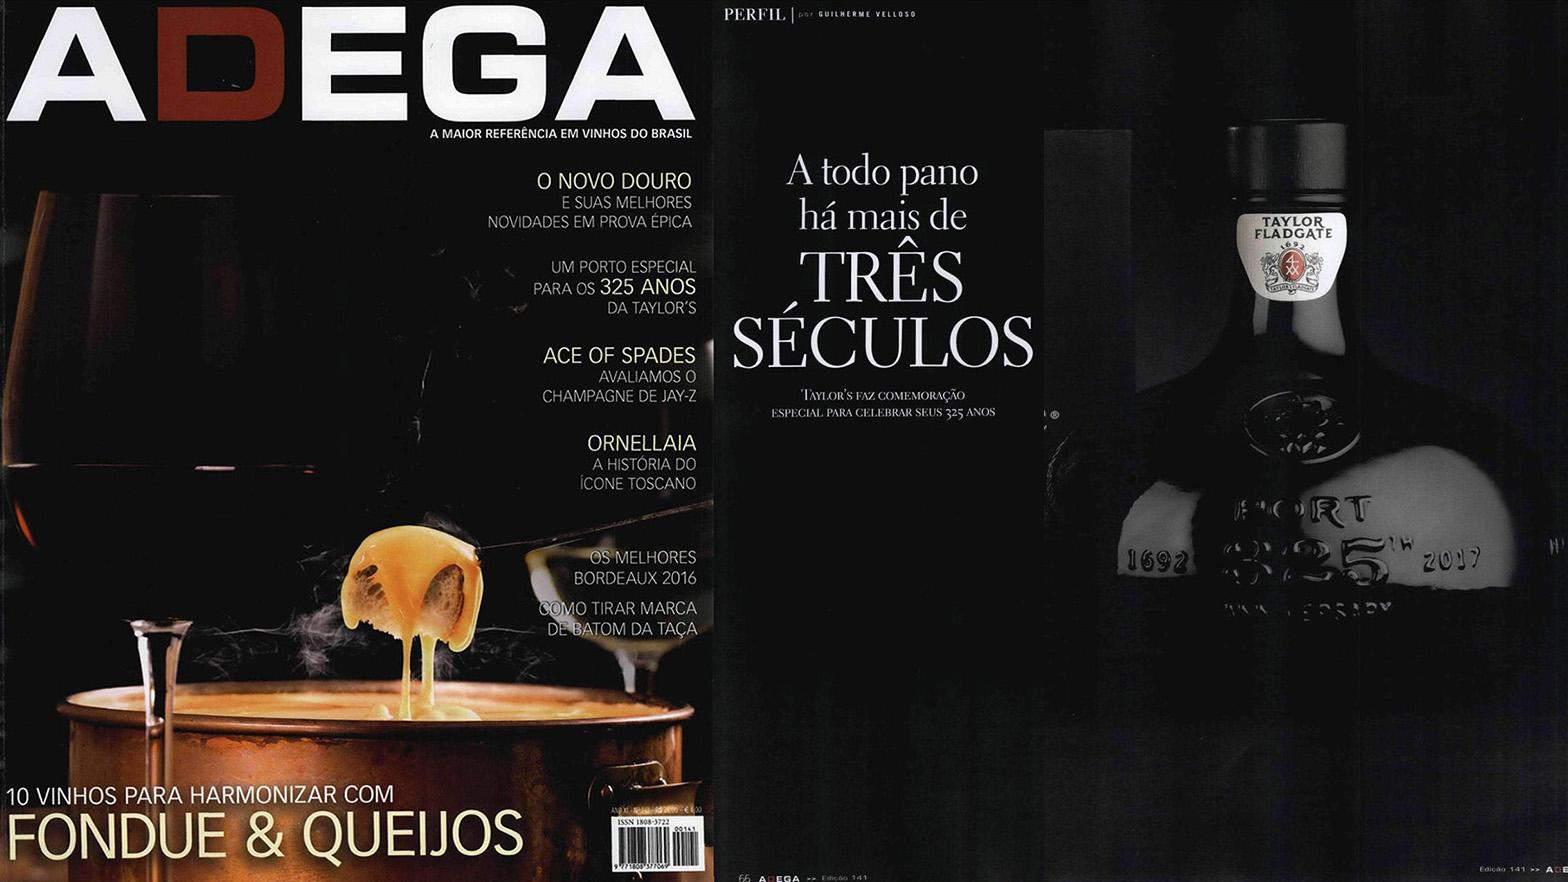 Revista Adega: Qualimpor